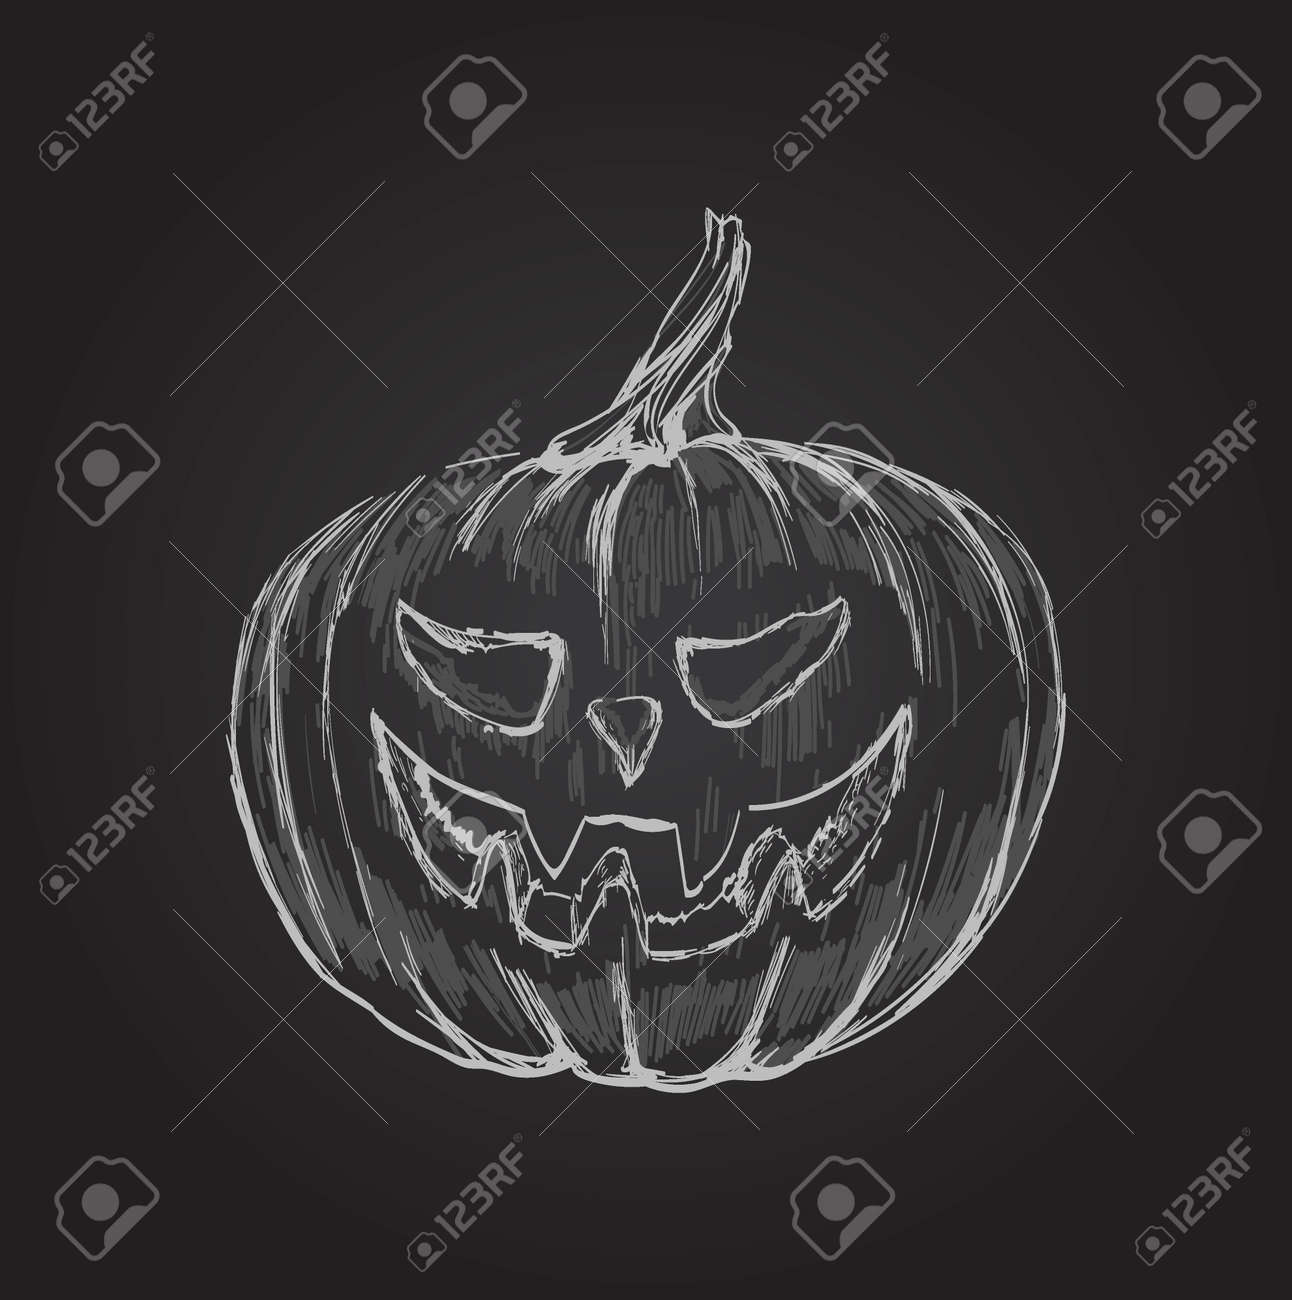 Halloween Pumpkin Hand Drawing Vector Illustration. - 171314214